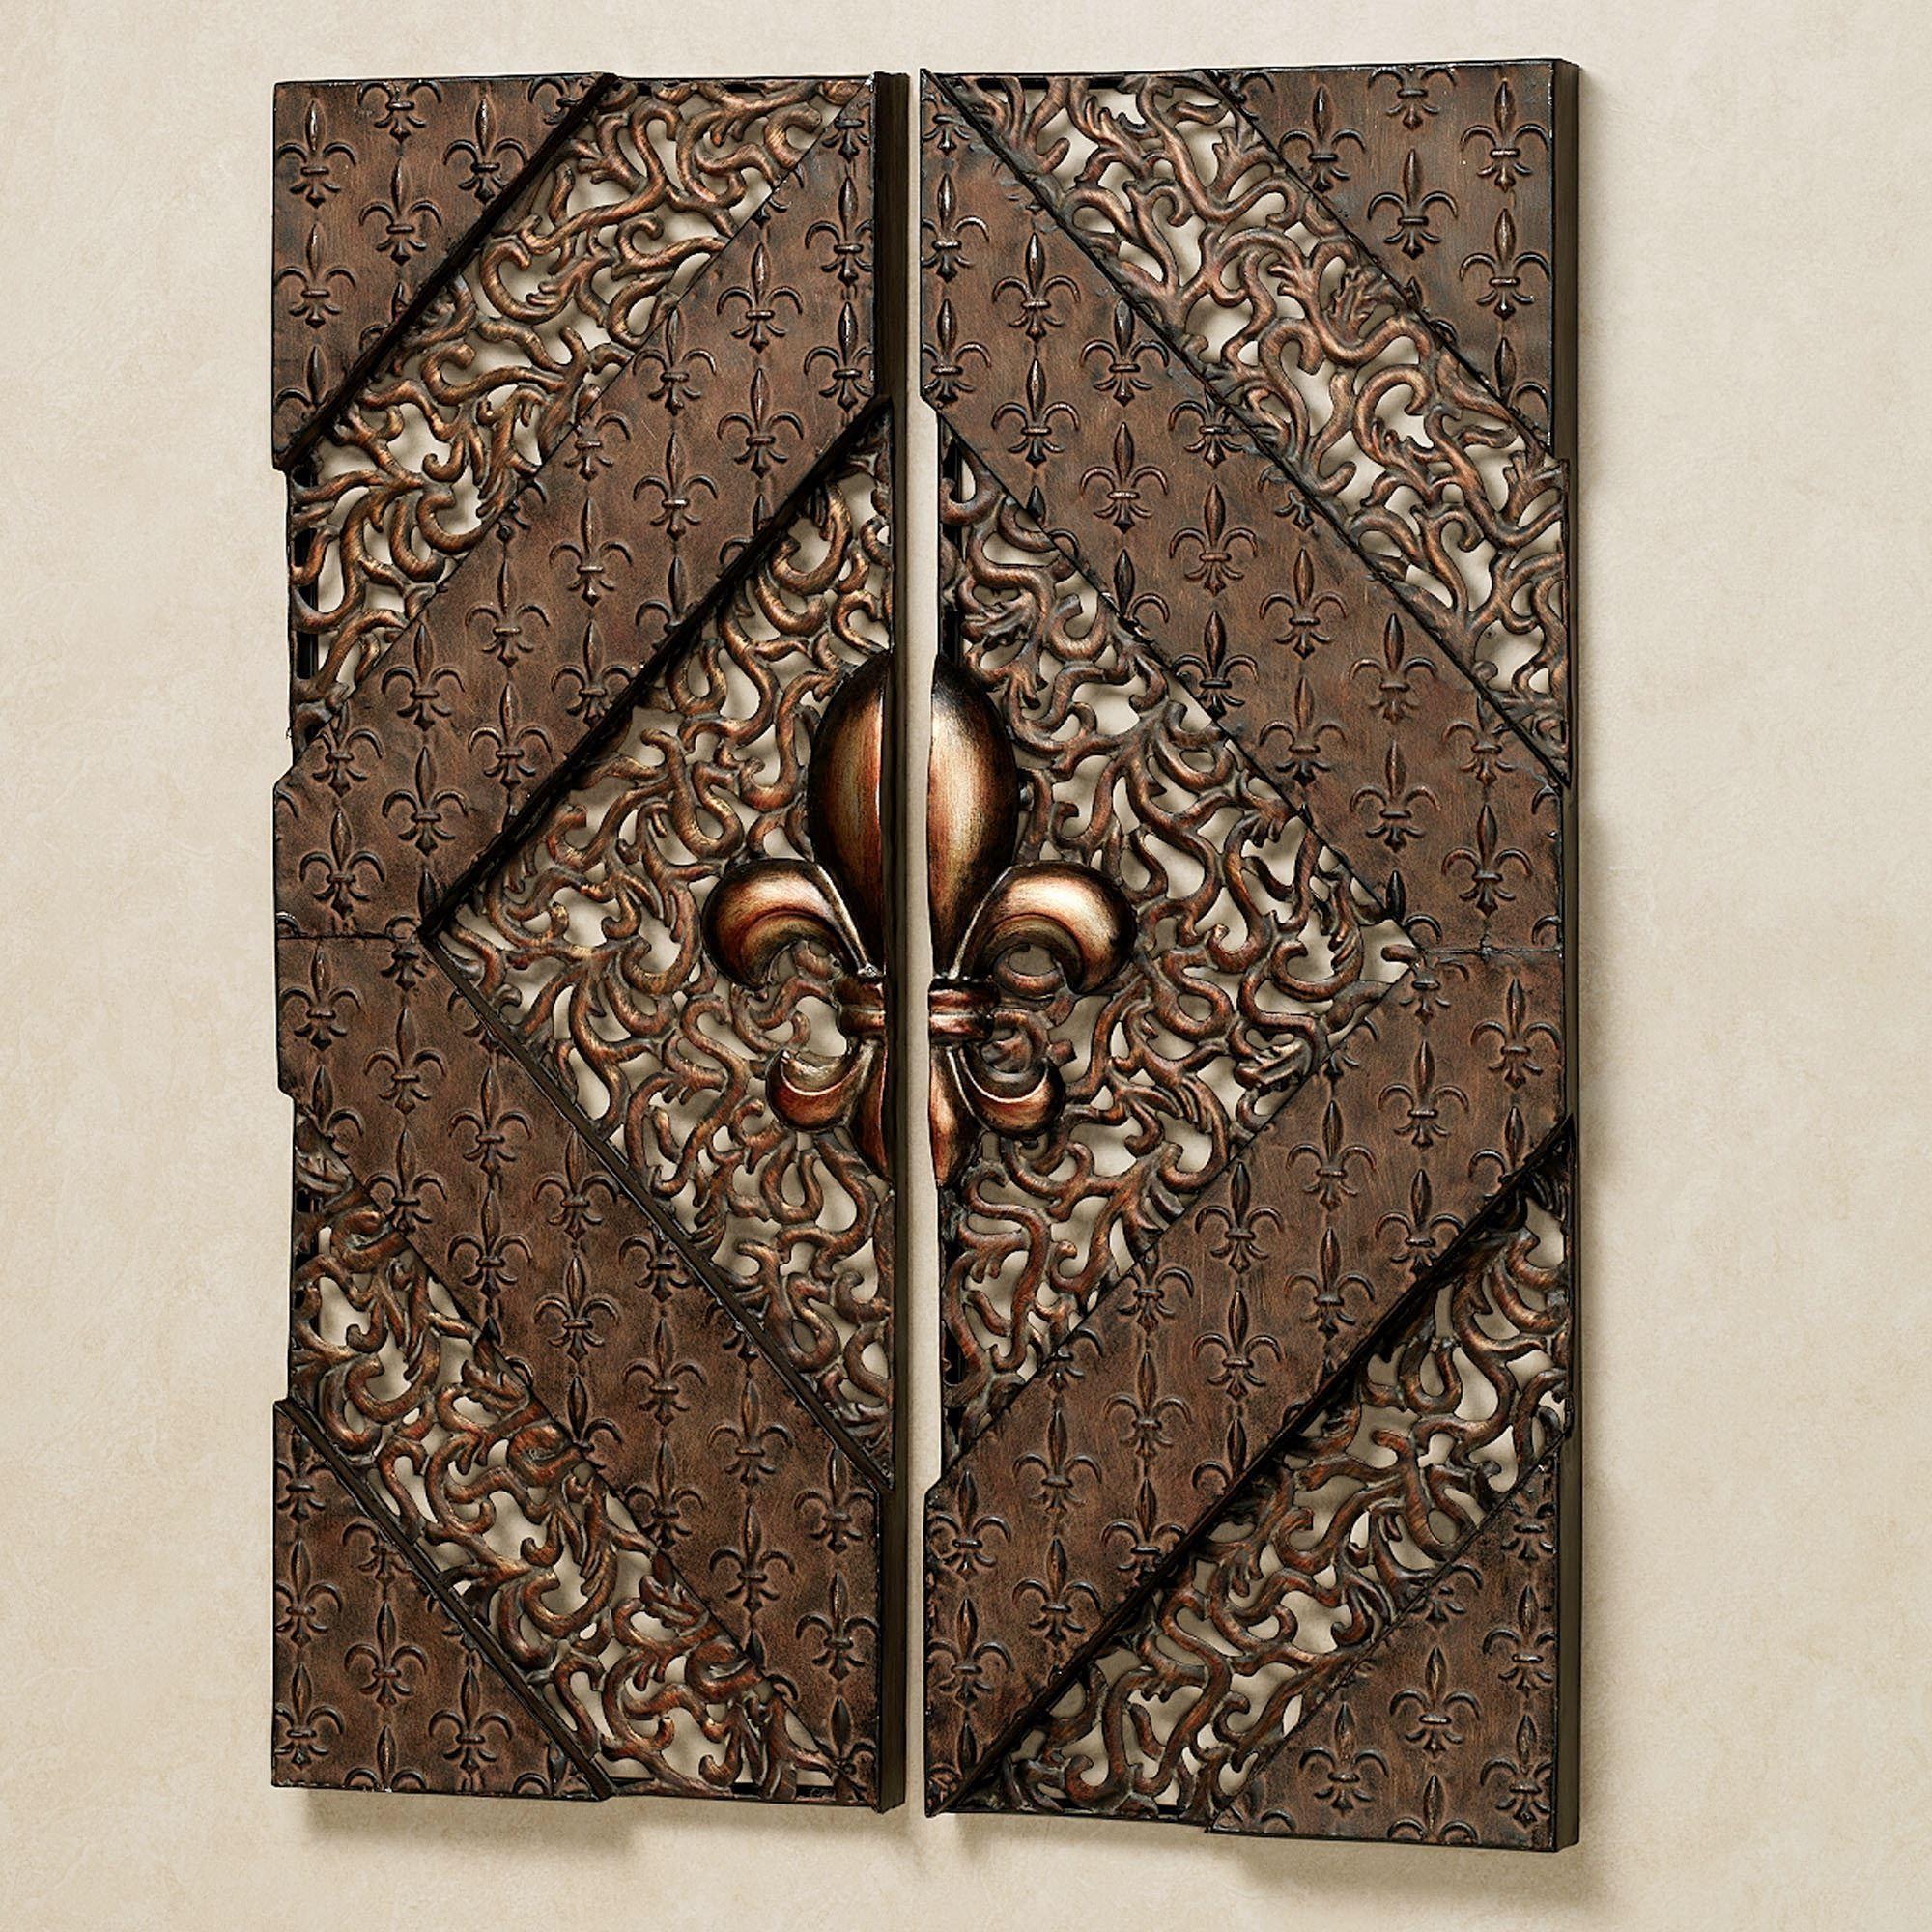 Fleur De Lis Metal Wall Panel Set Throughout Metal Fleur De Lis Wall Art (Image 6 of 20)